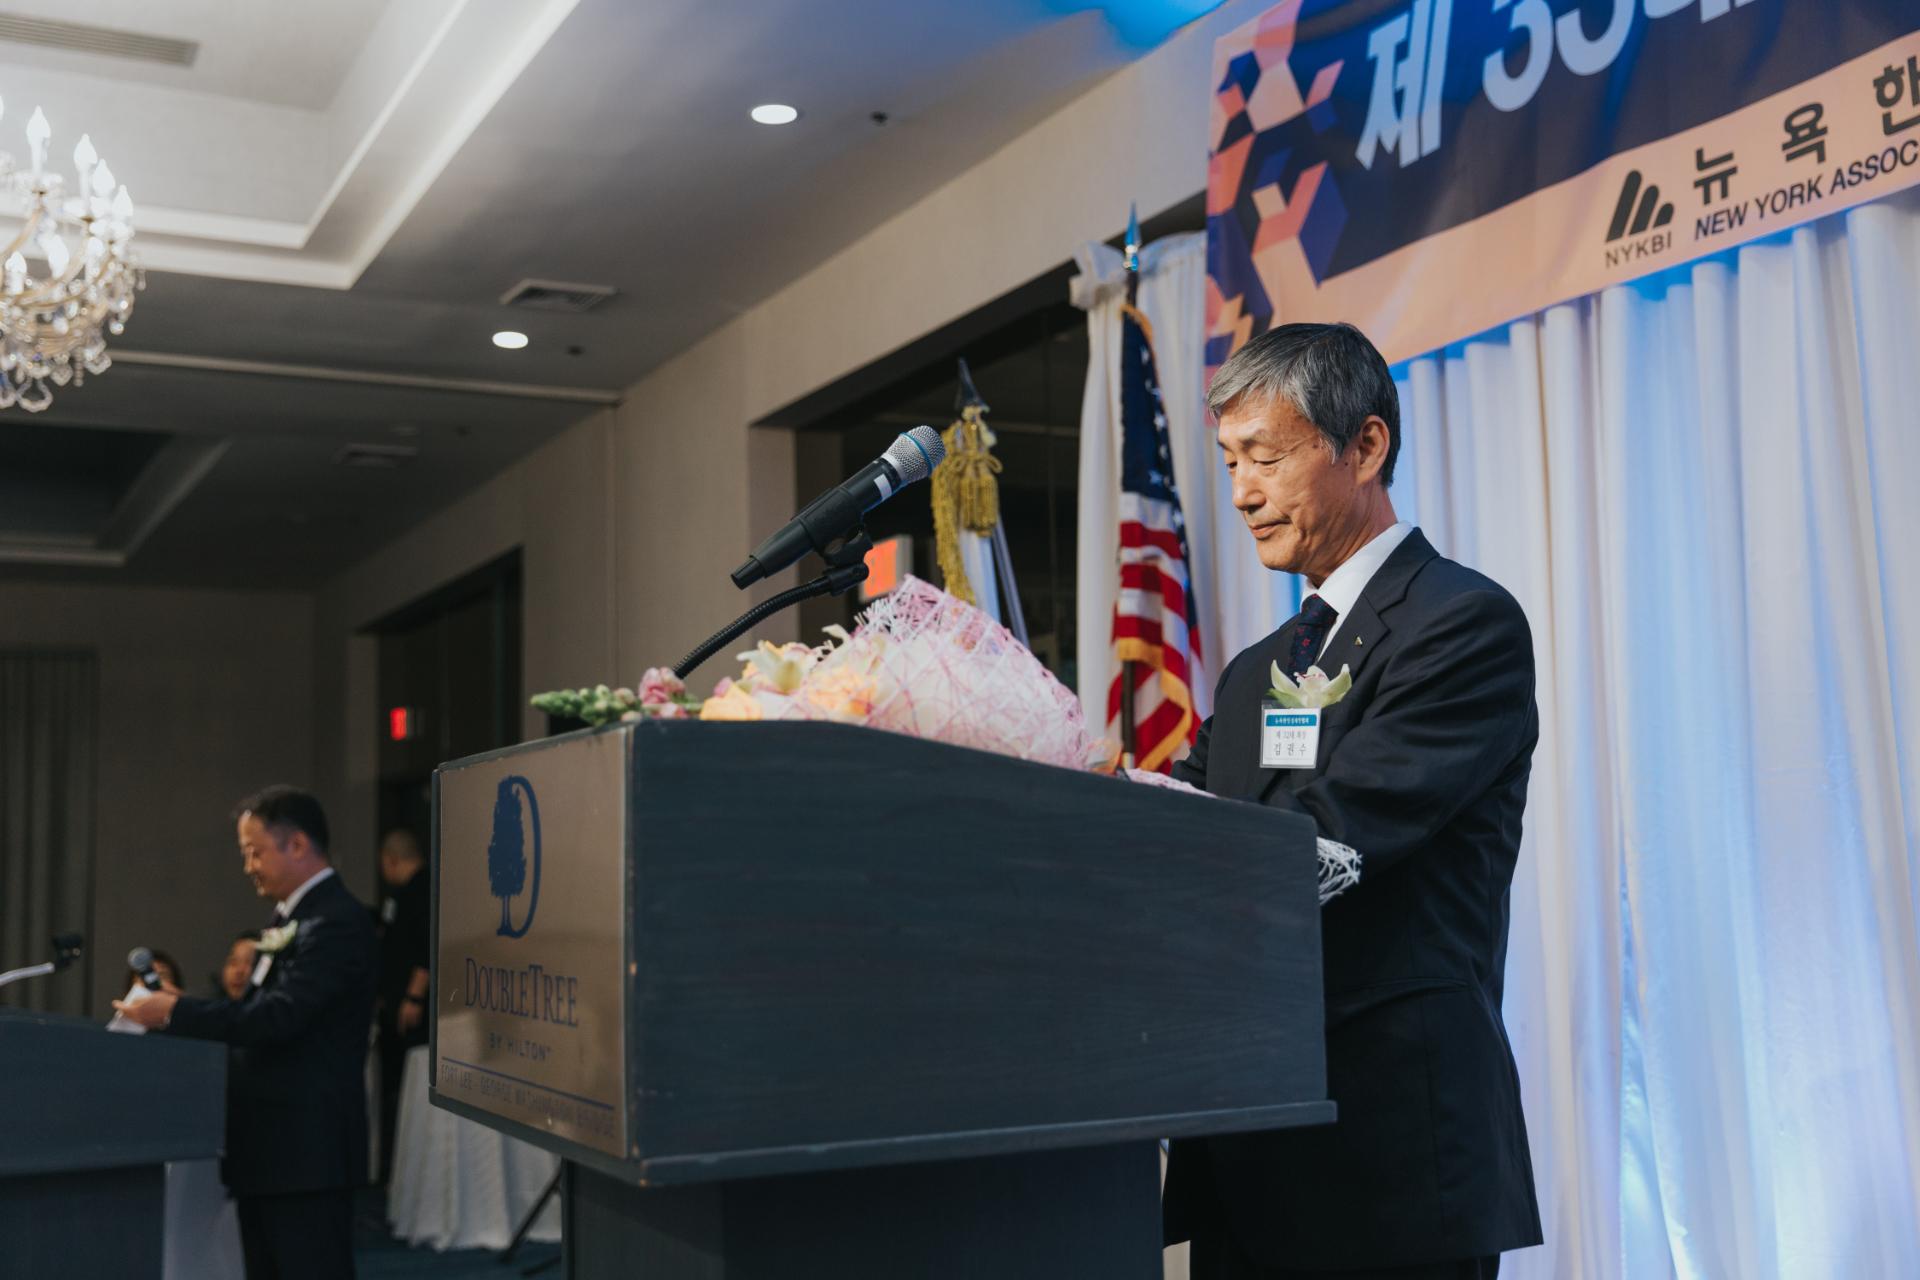 https://nykbi.com/new/wp-content/uploads/2019/07/190607-NYKBI-Inauguration-Ceremony-056.jpg